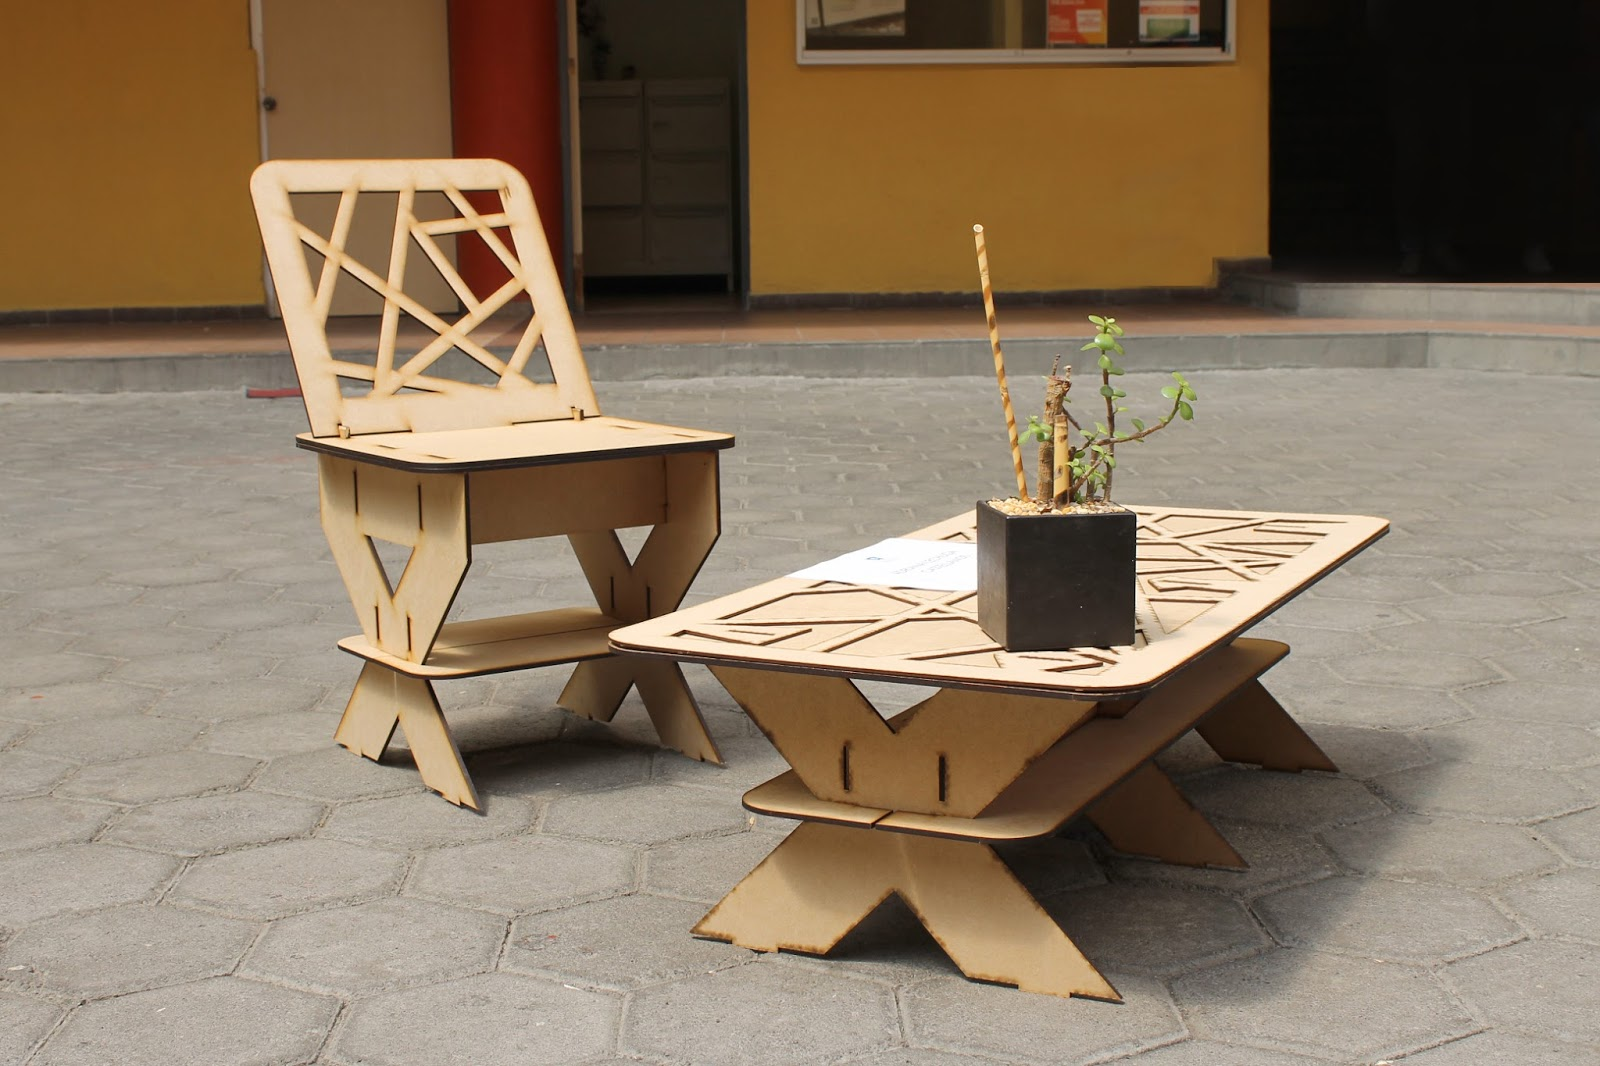 Flat furniture design universidad del pedregal juventudes for Historia del mueble pdf